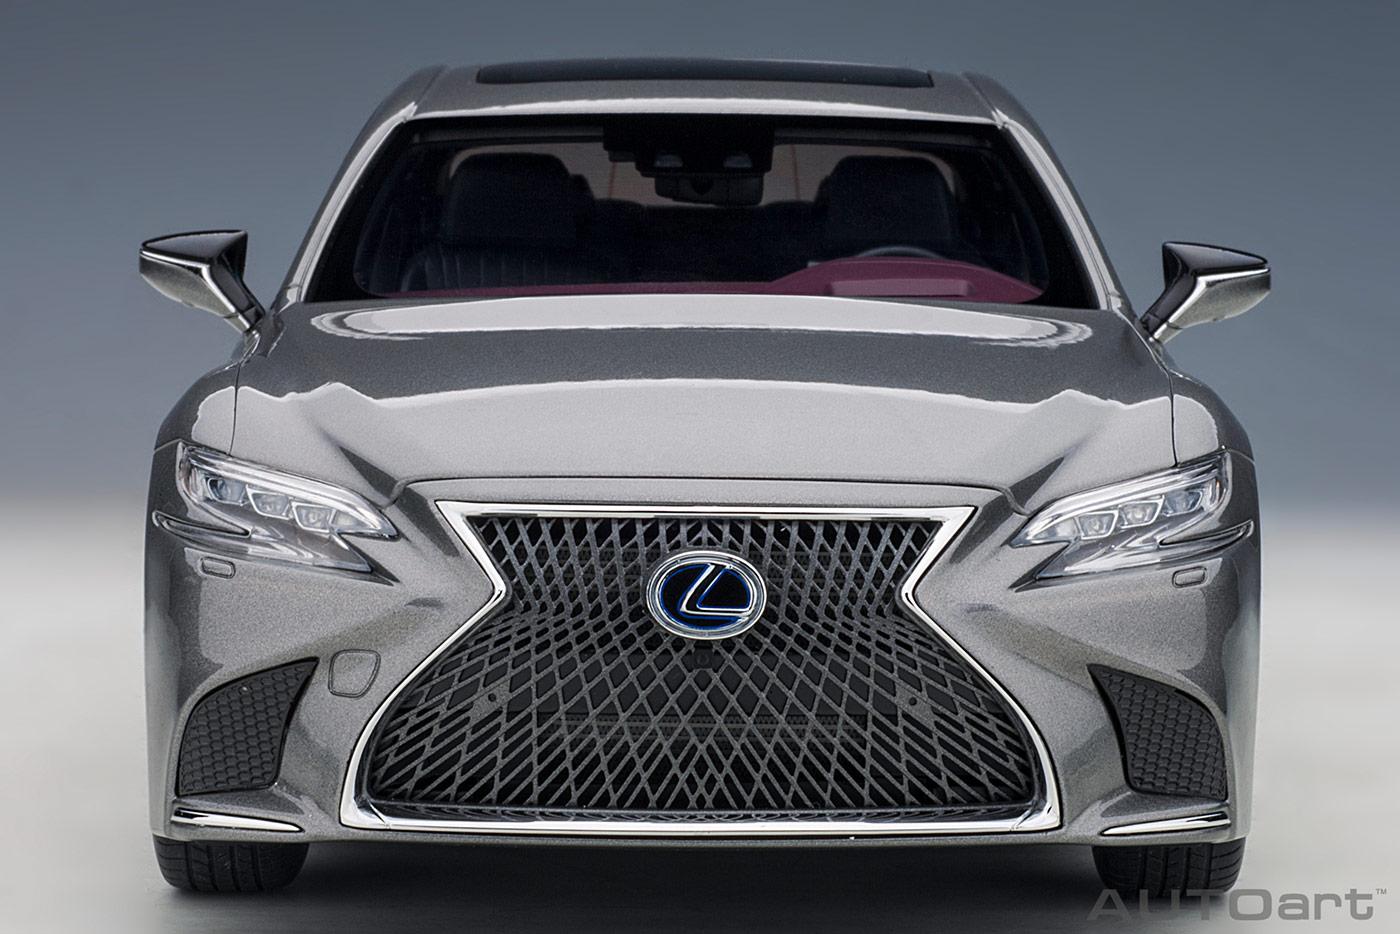 78867 Lexus LS500h AUTOart calandre